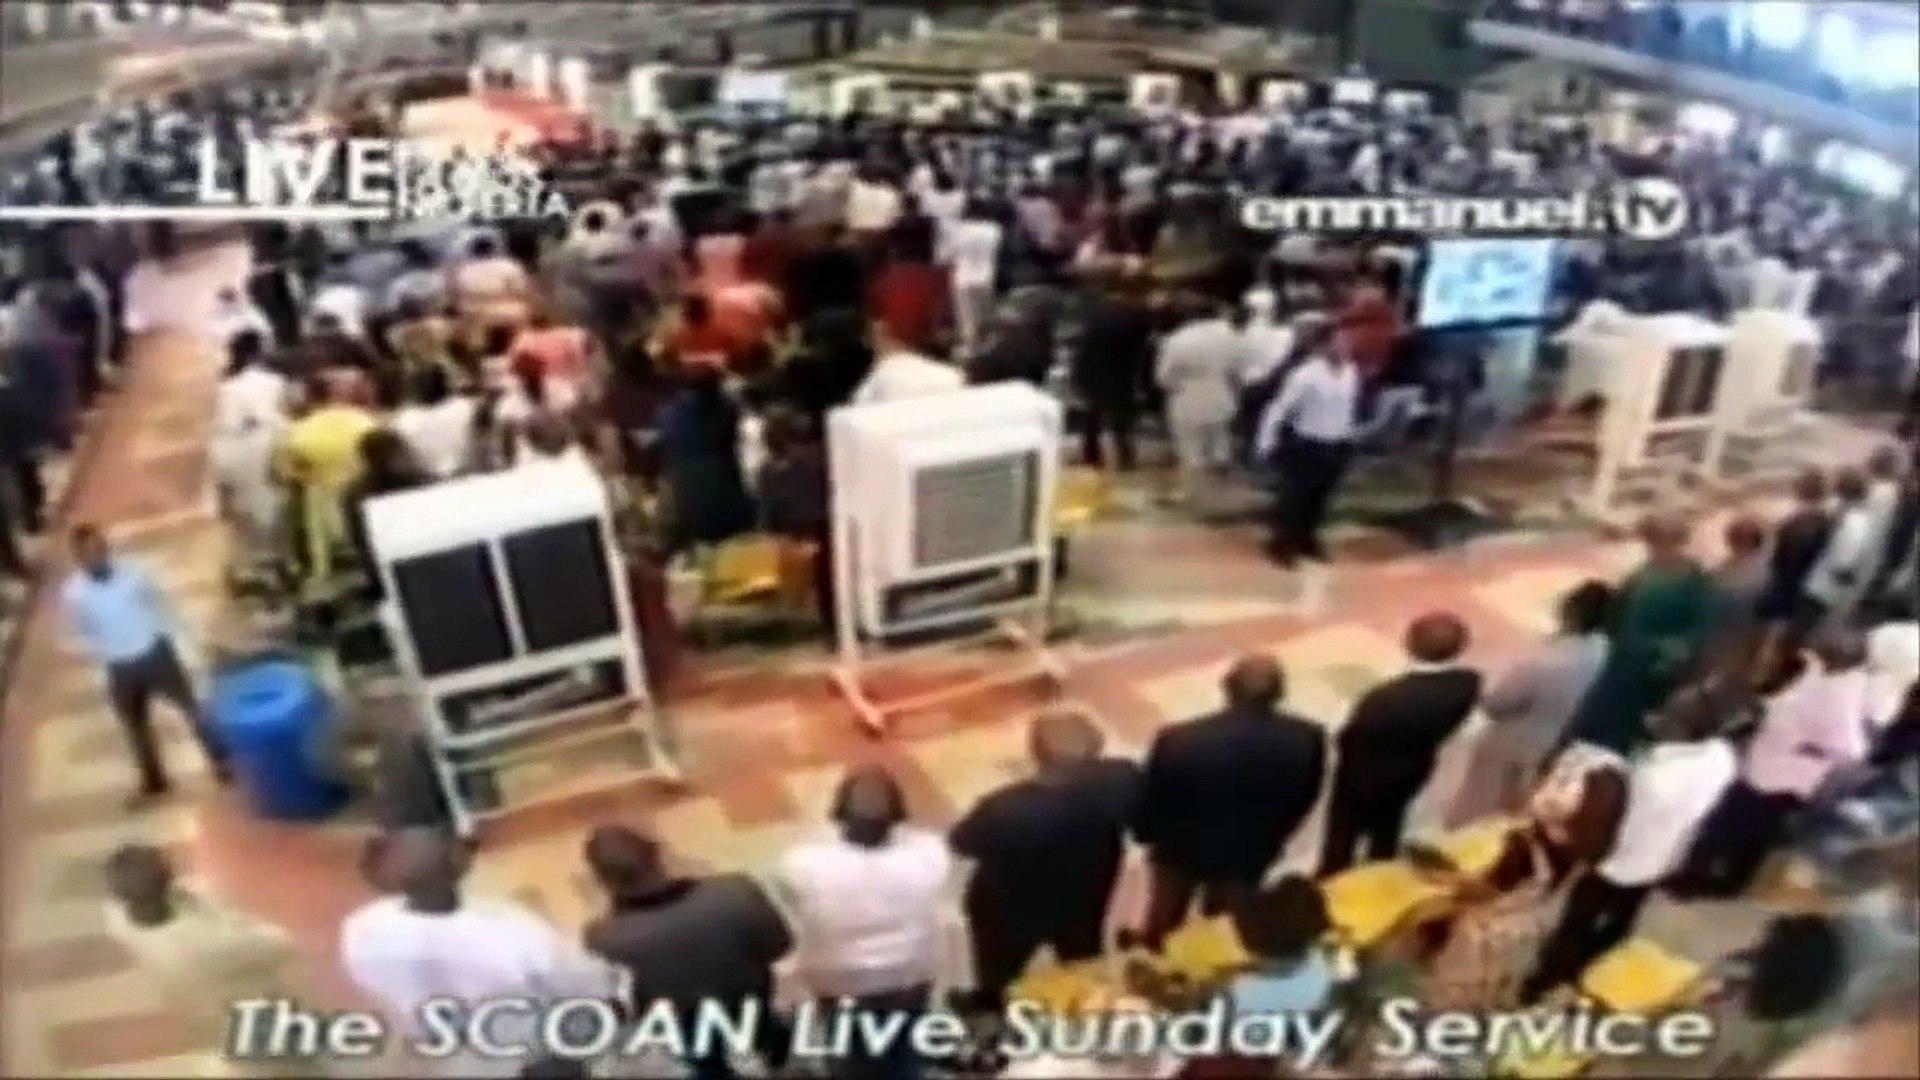 SCOAN  31/08/14: TB Joshua Prophecy: Big Shot In Nigeria / Pray For Nigerian Nation, Emmanuel TV